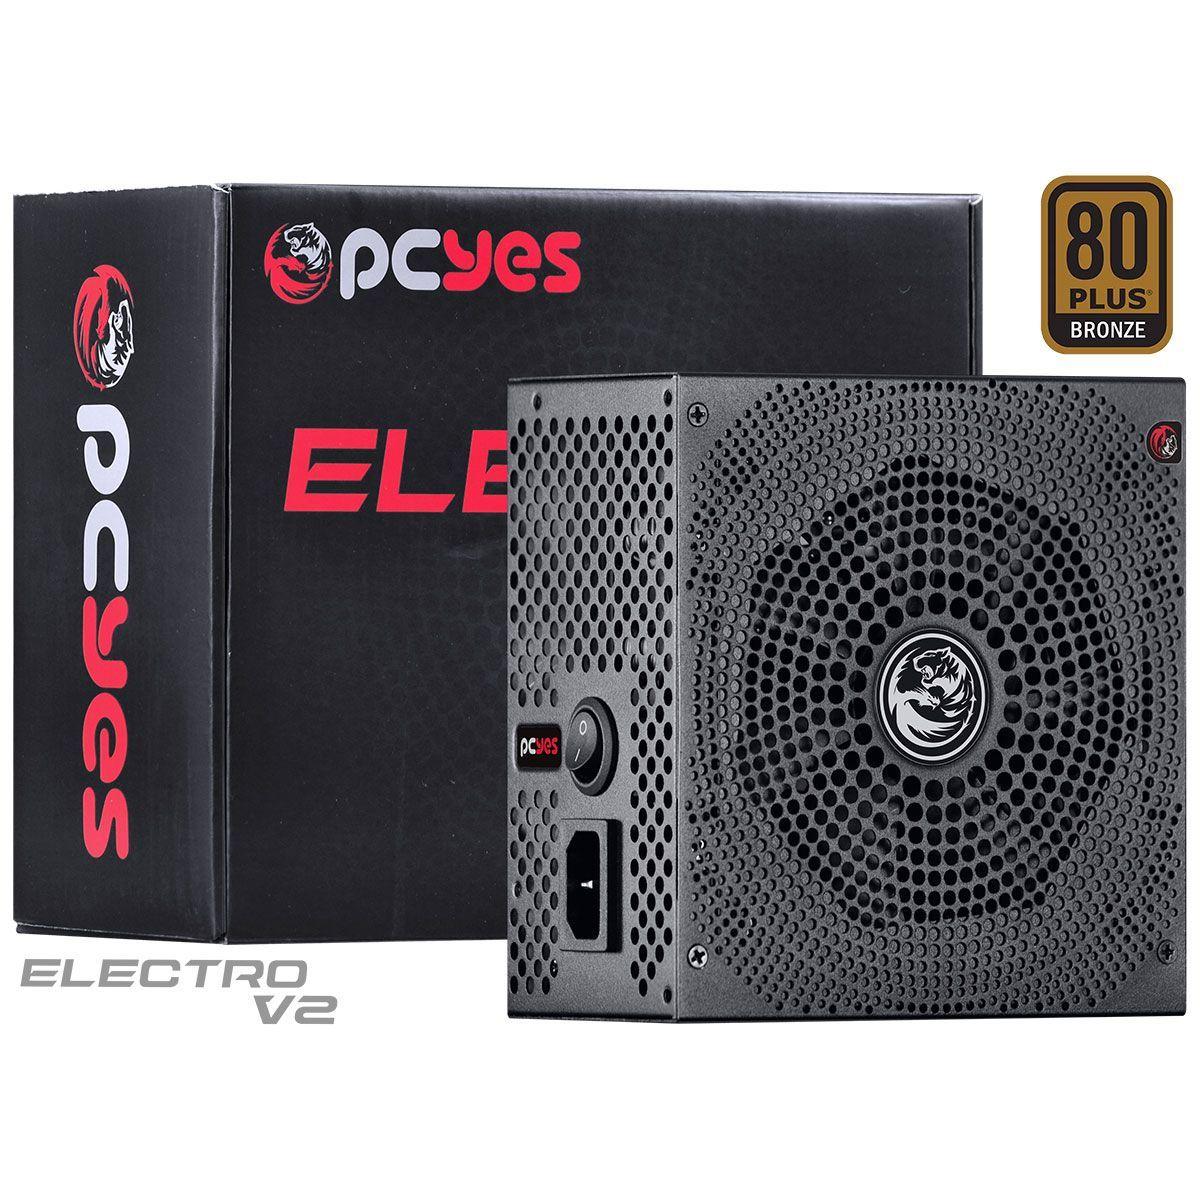 Fonte PCYes Electro V2 500w 80 Plus Bronze - ELECV2PTO500W